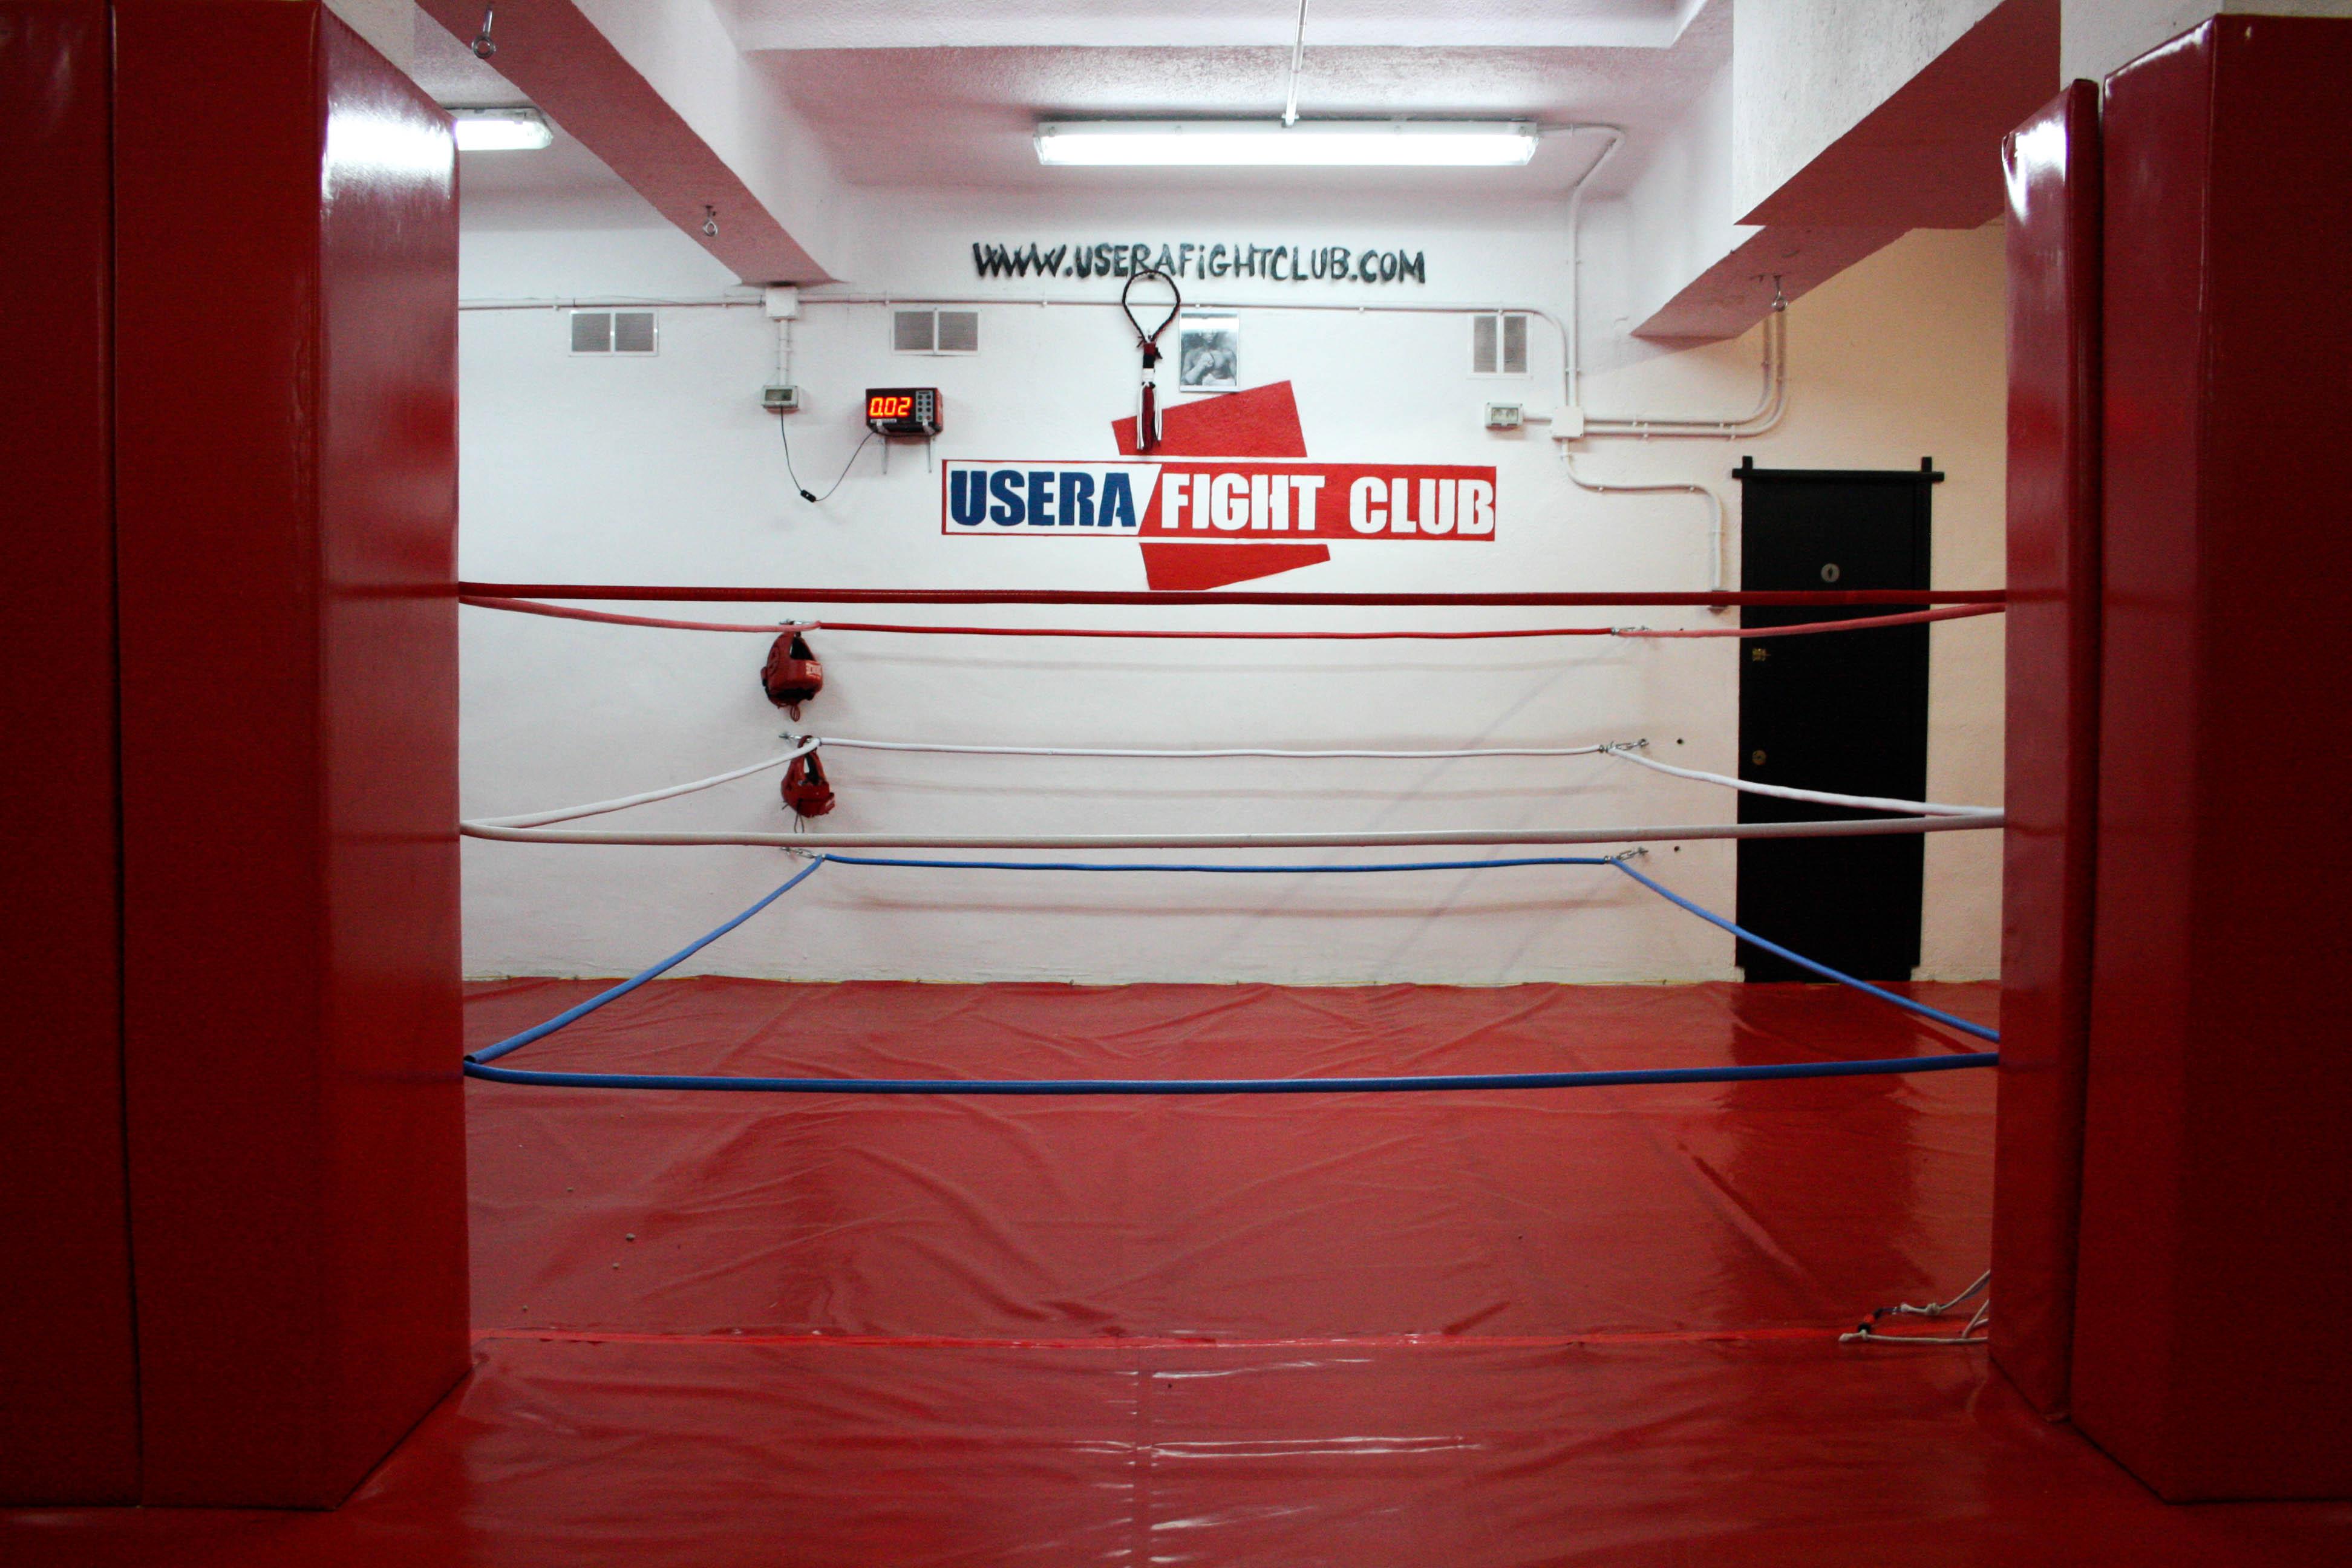 usera fight club mongkol reloj entrenamiento rin